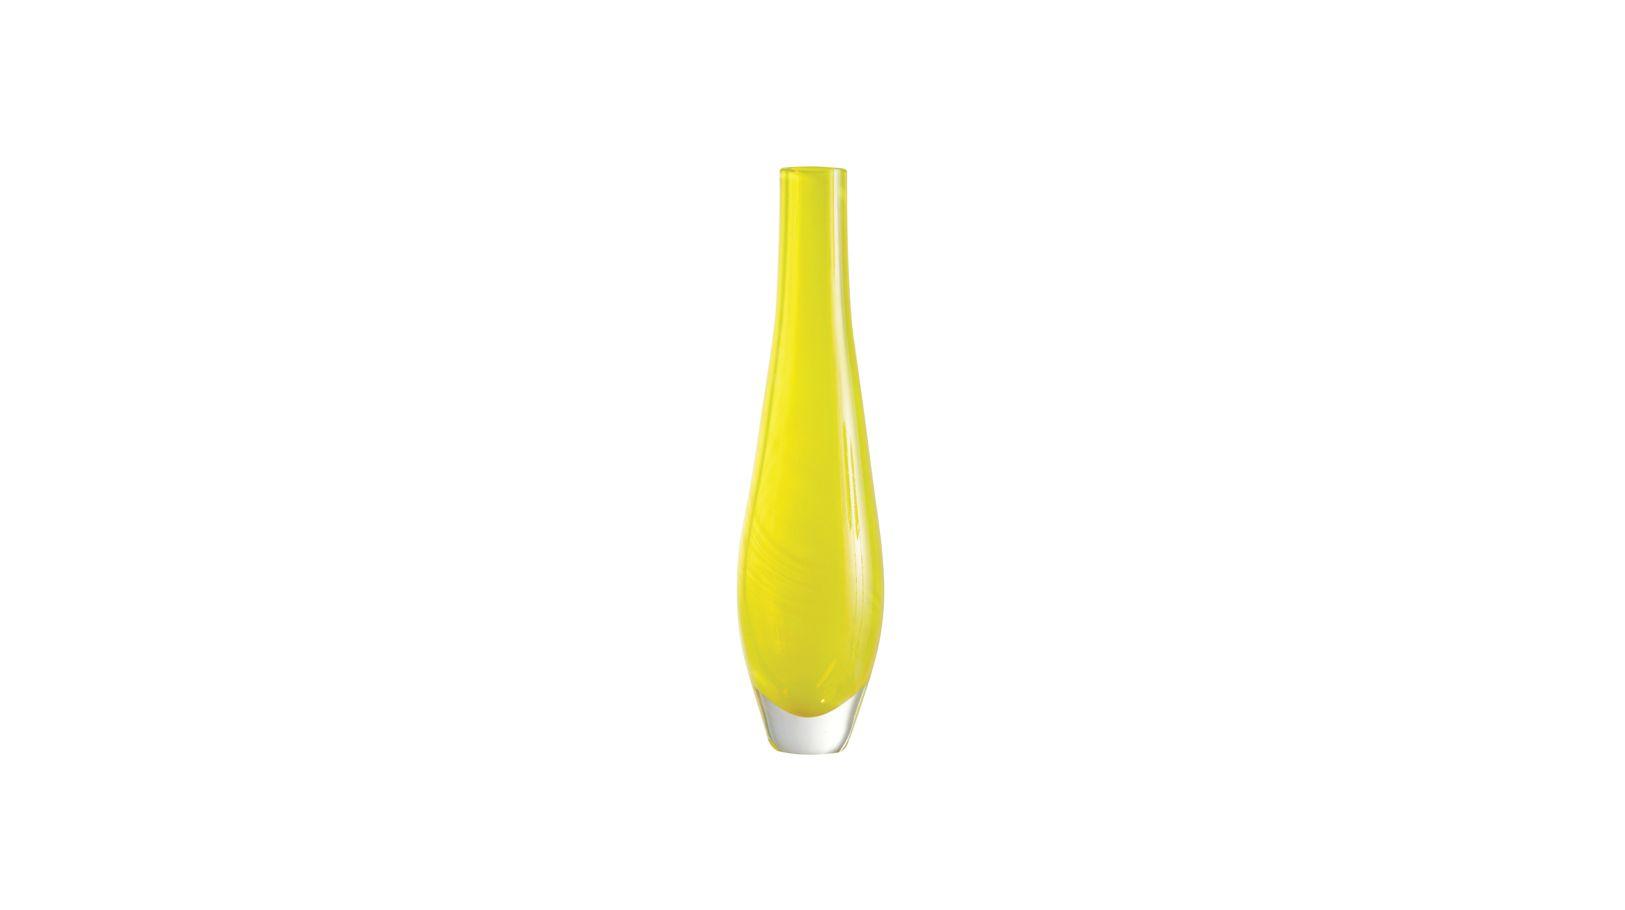 Yinyang Vase Roche Bobois